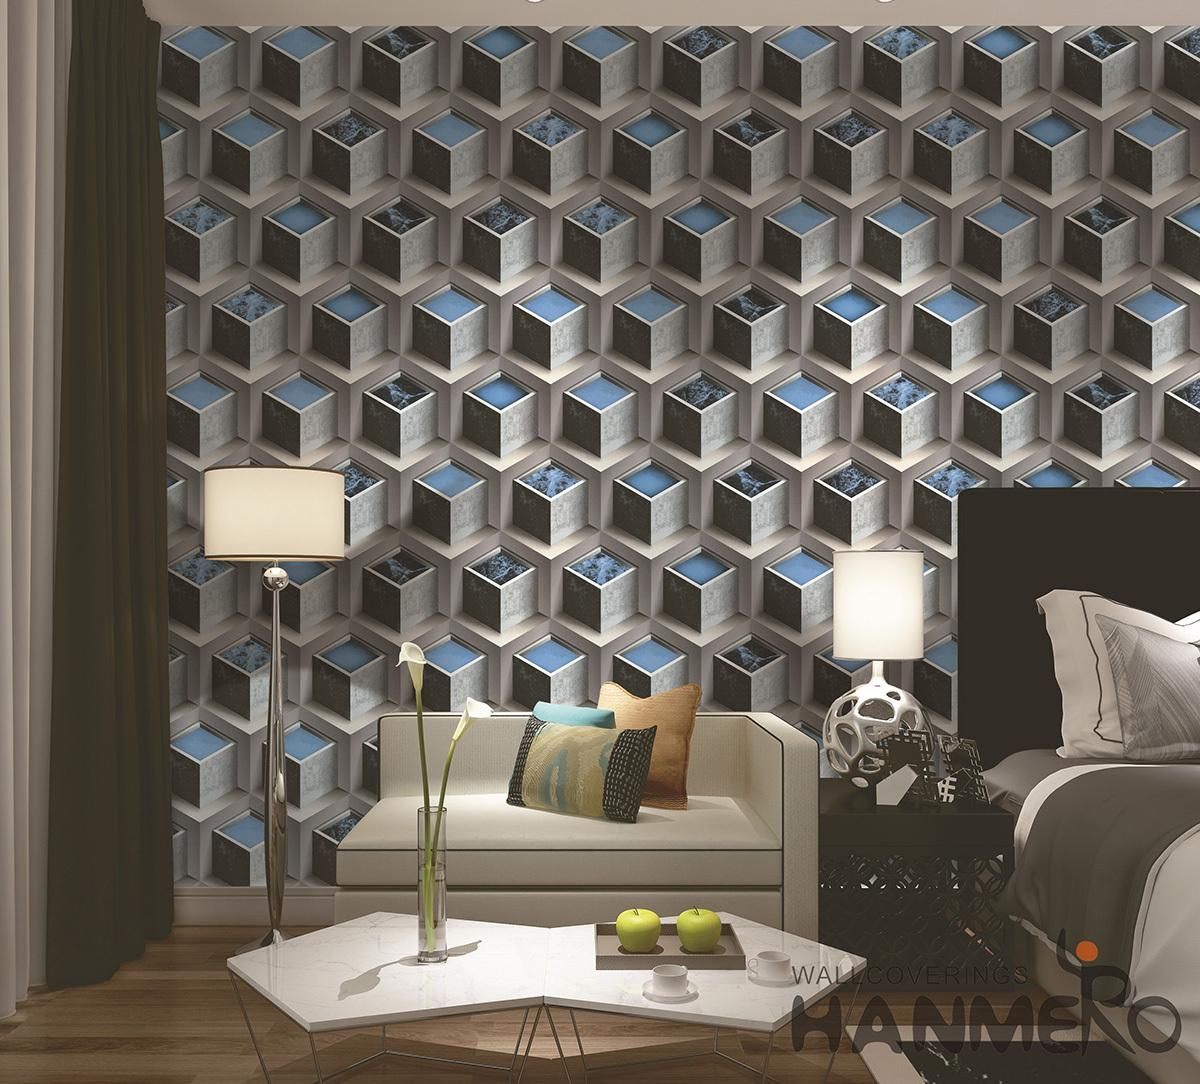 PVC 3D Effect Wallpaper Designs 0 53 10M Per Roll Building